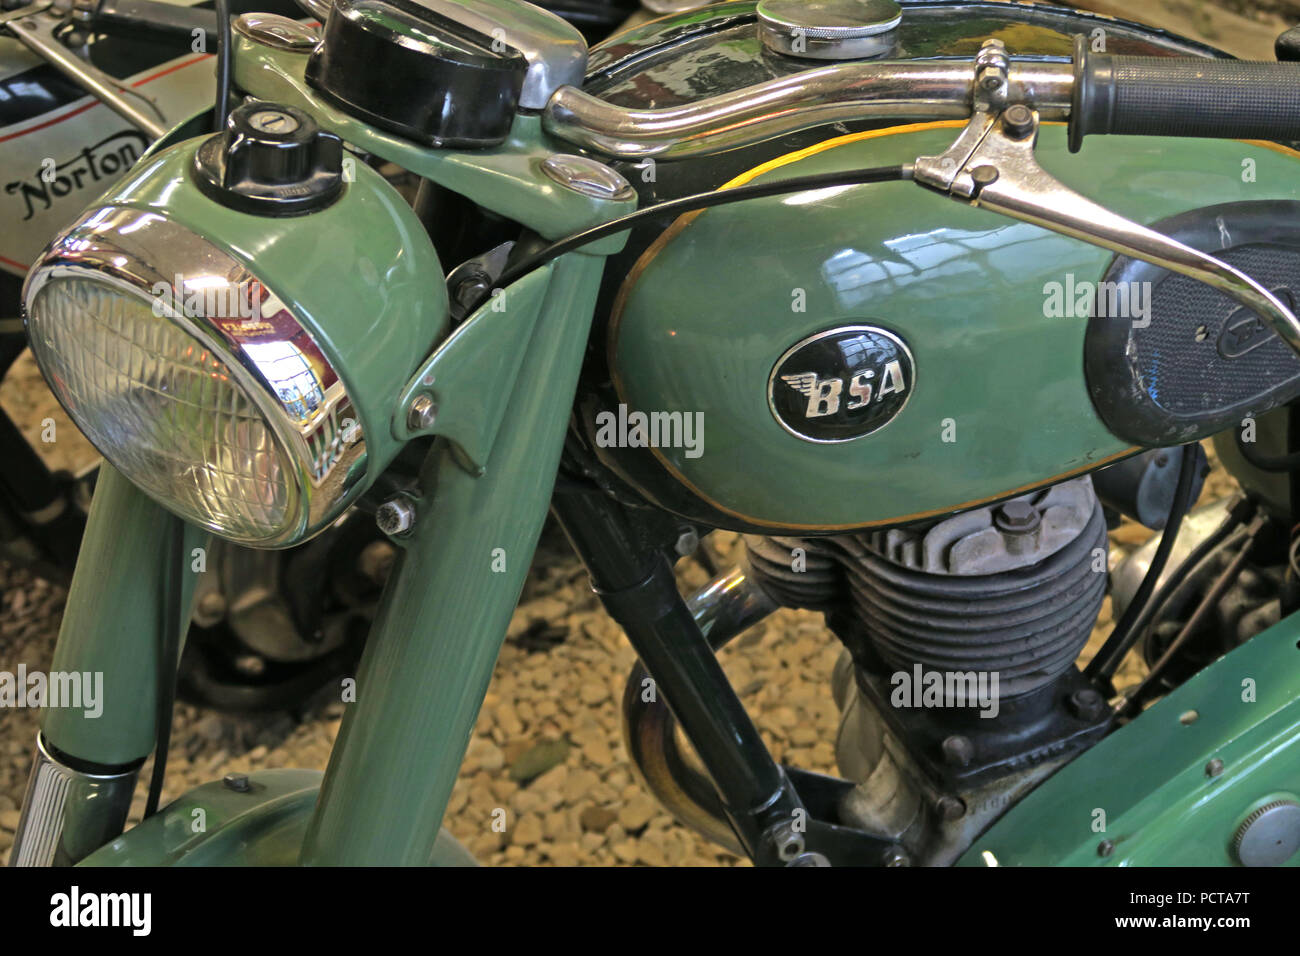 BSA Motor bike in sea green - Stock Image